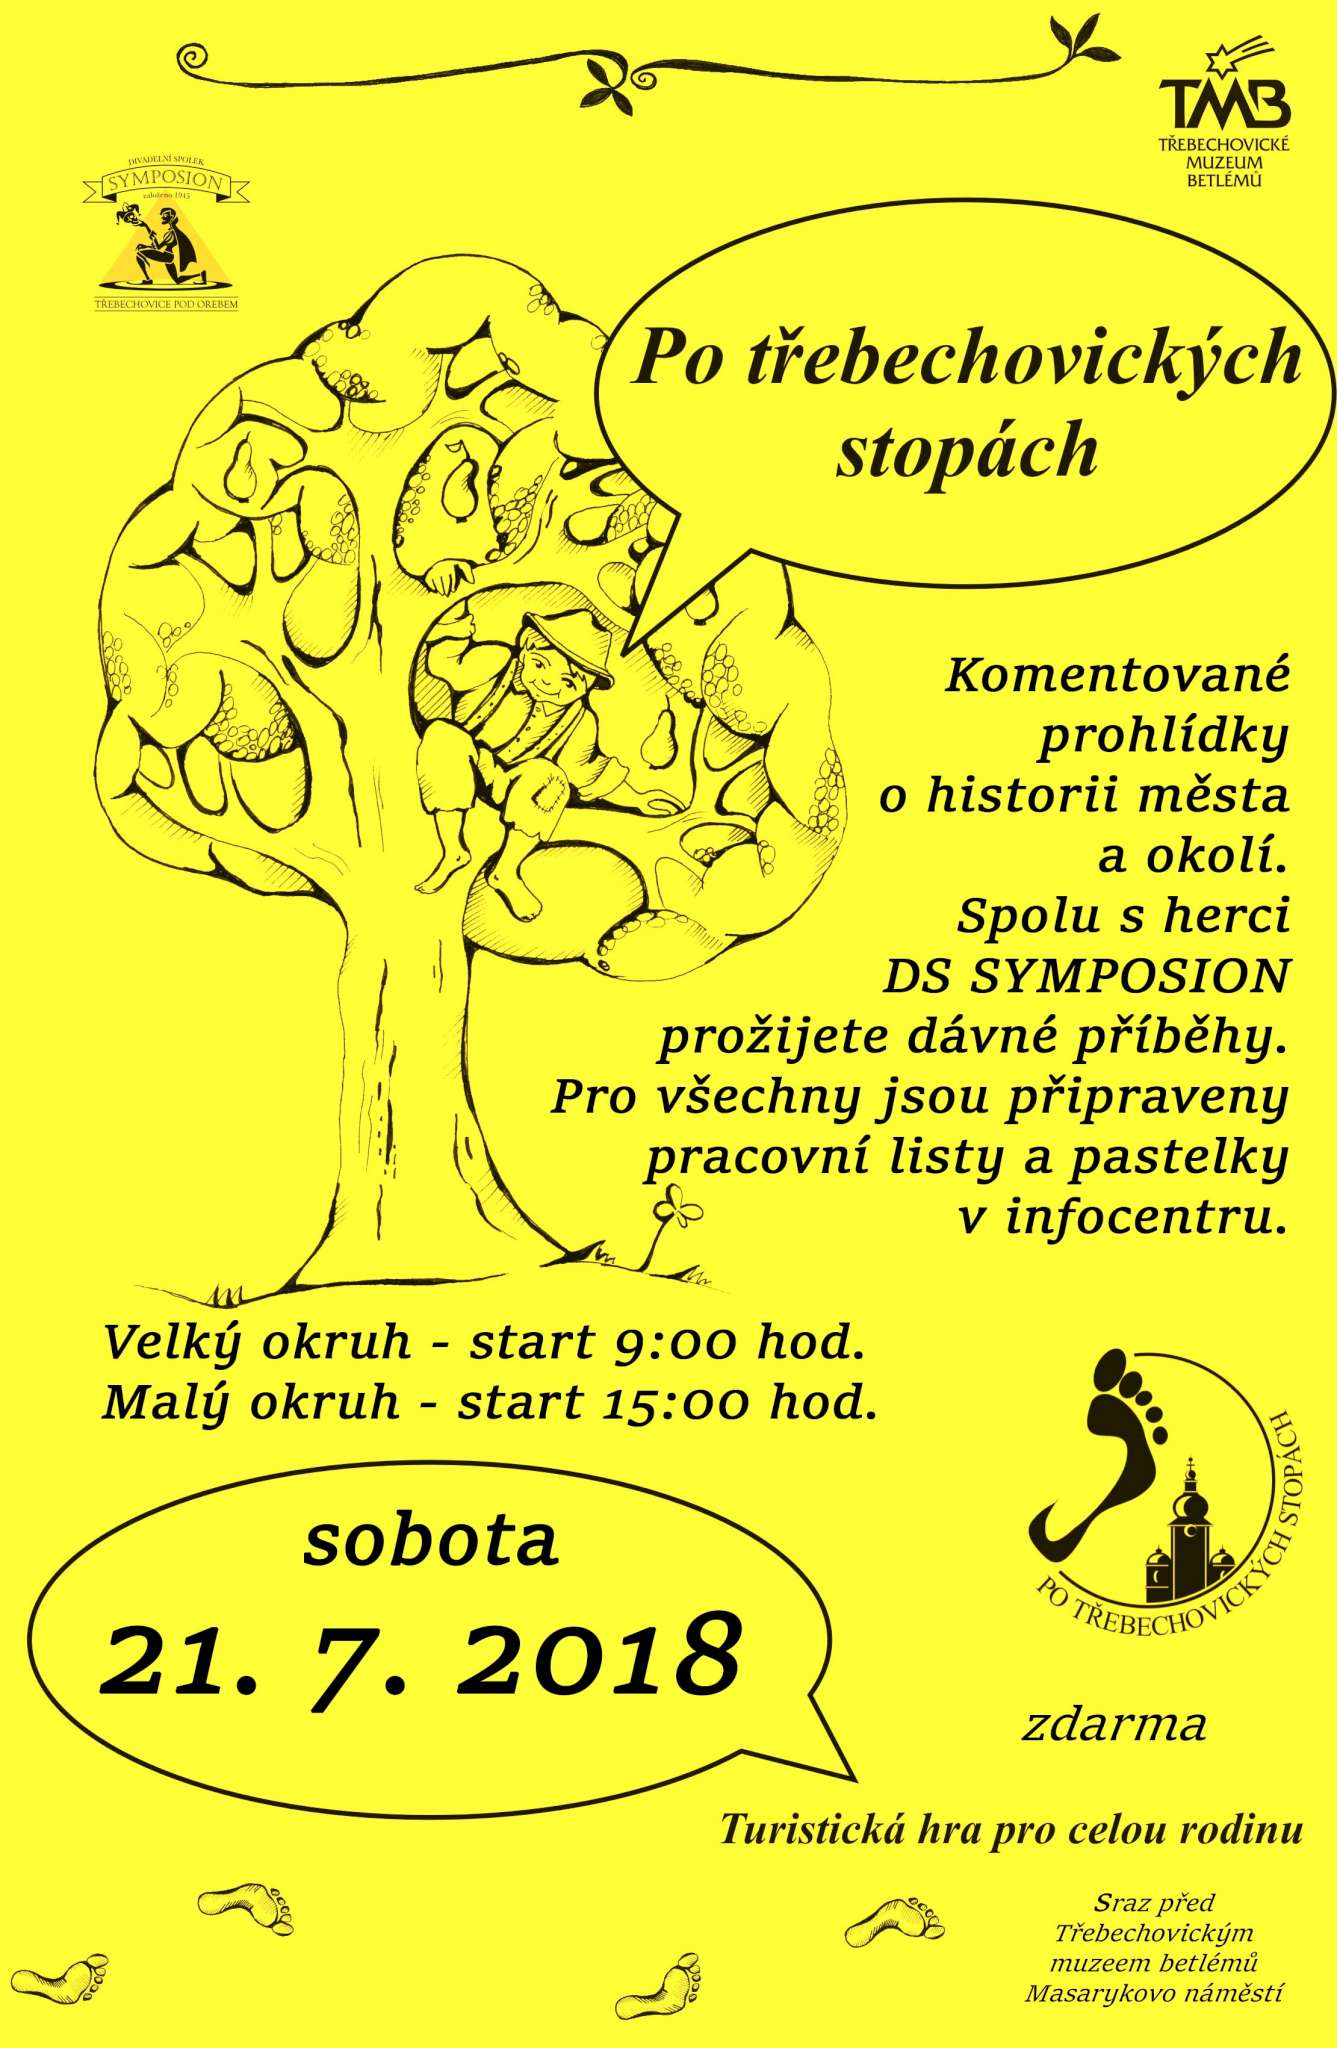 trebechovicka-stopa-2018-2048